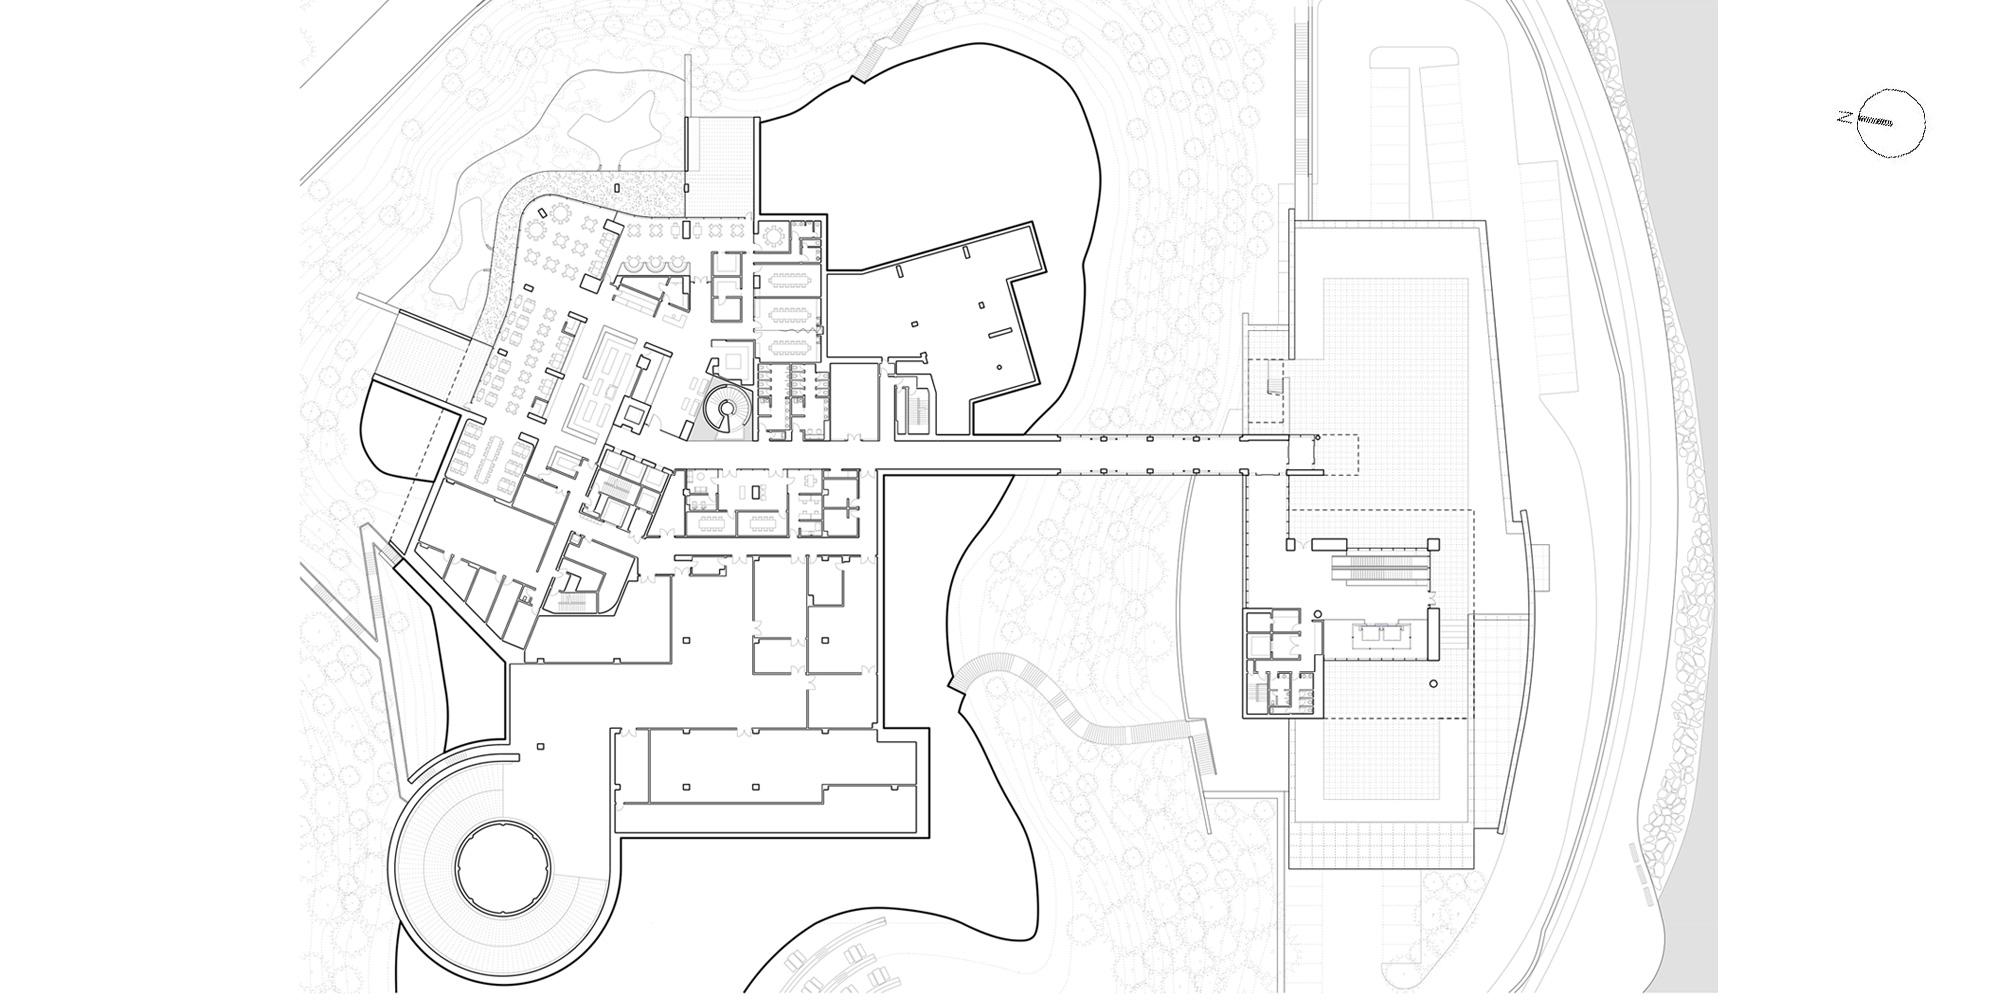 1st Floor Plan © Richard Meier & Partners Architects